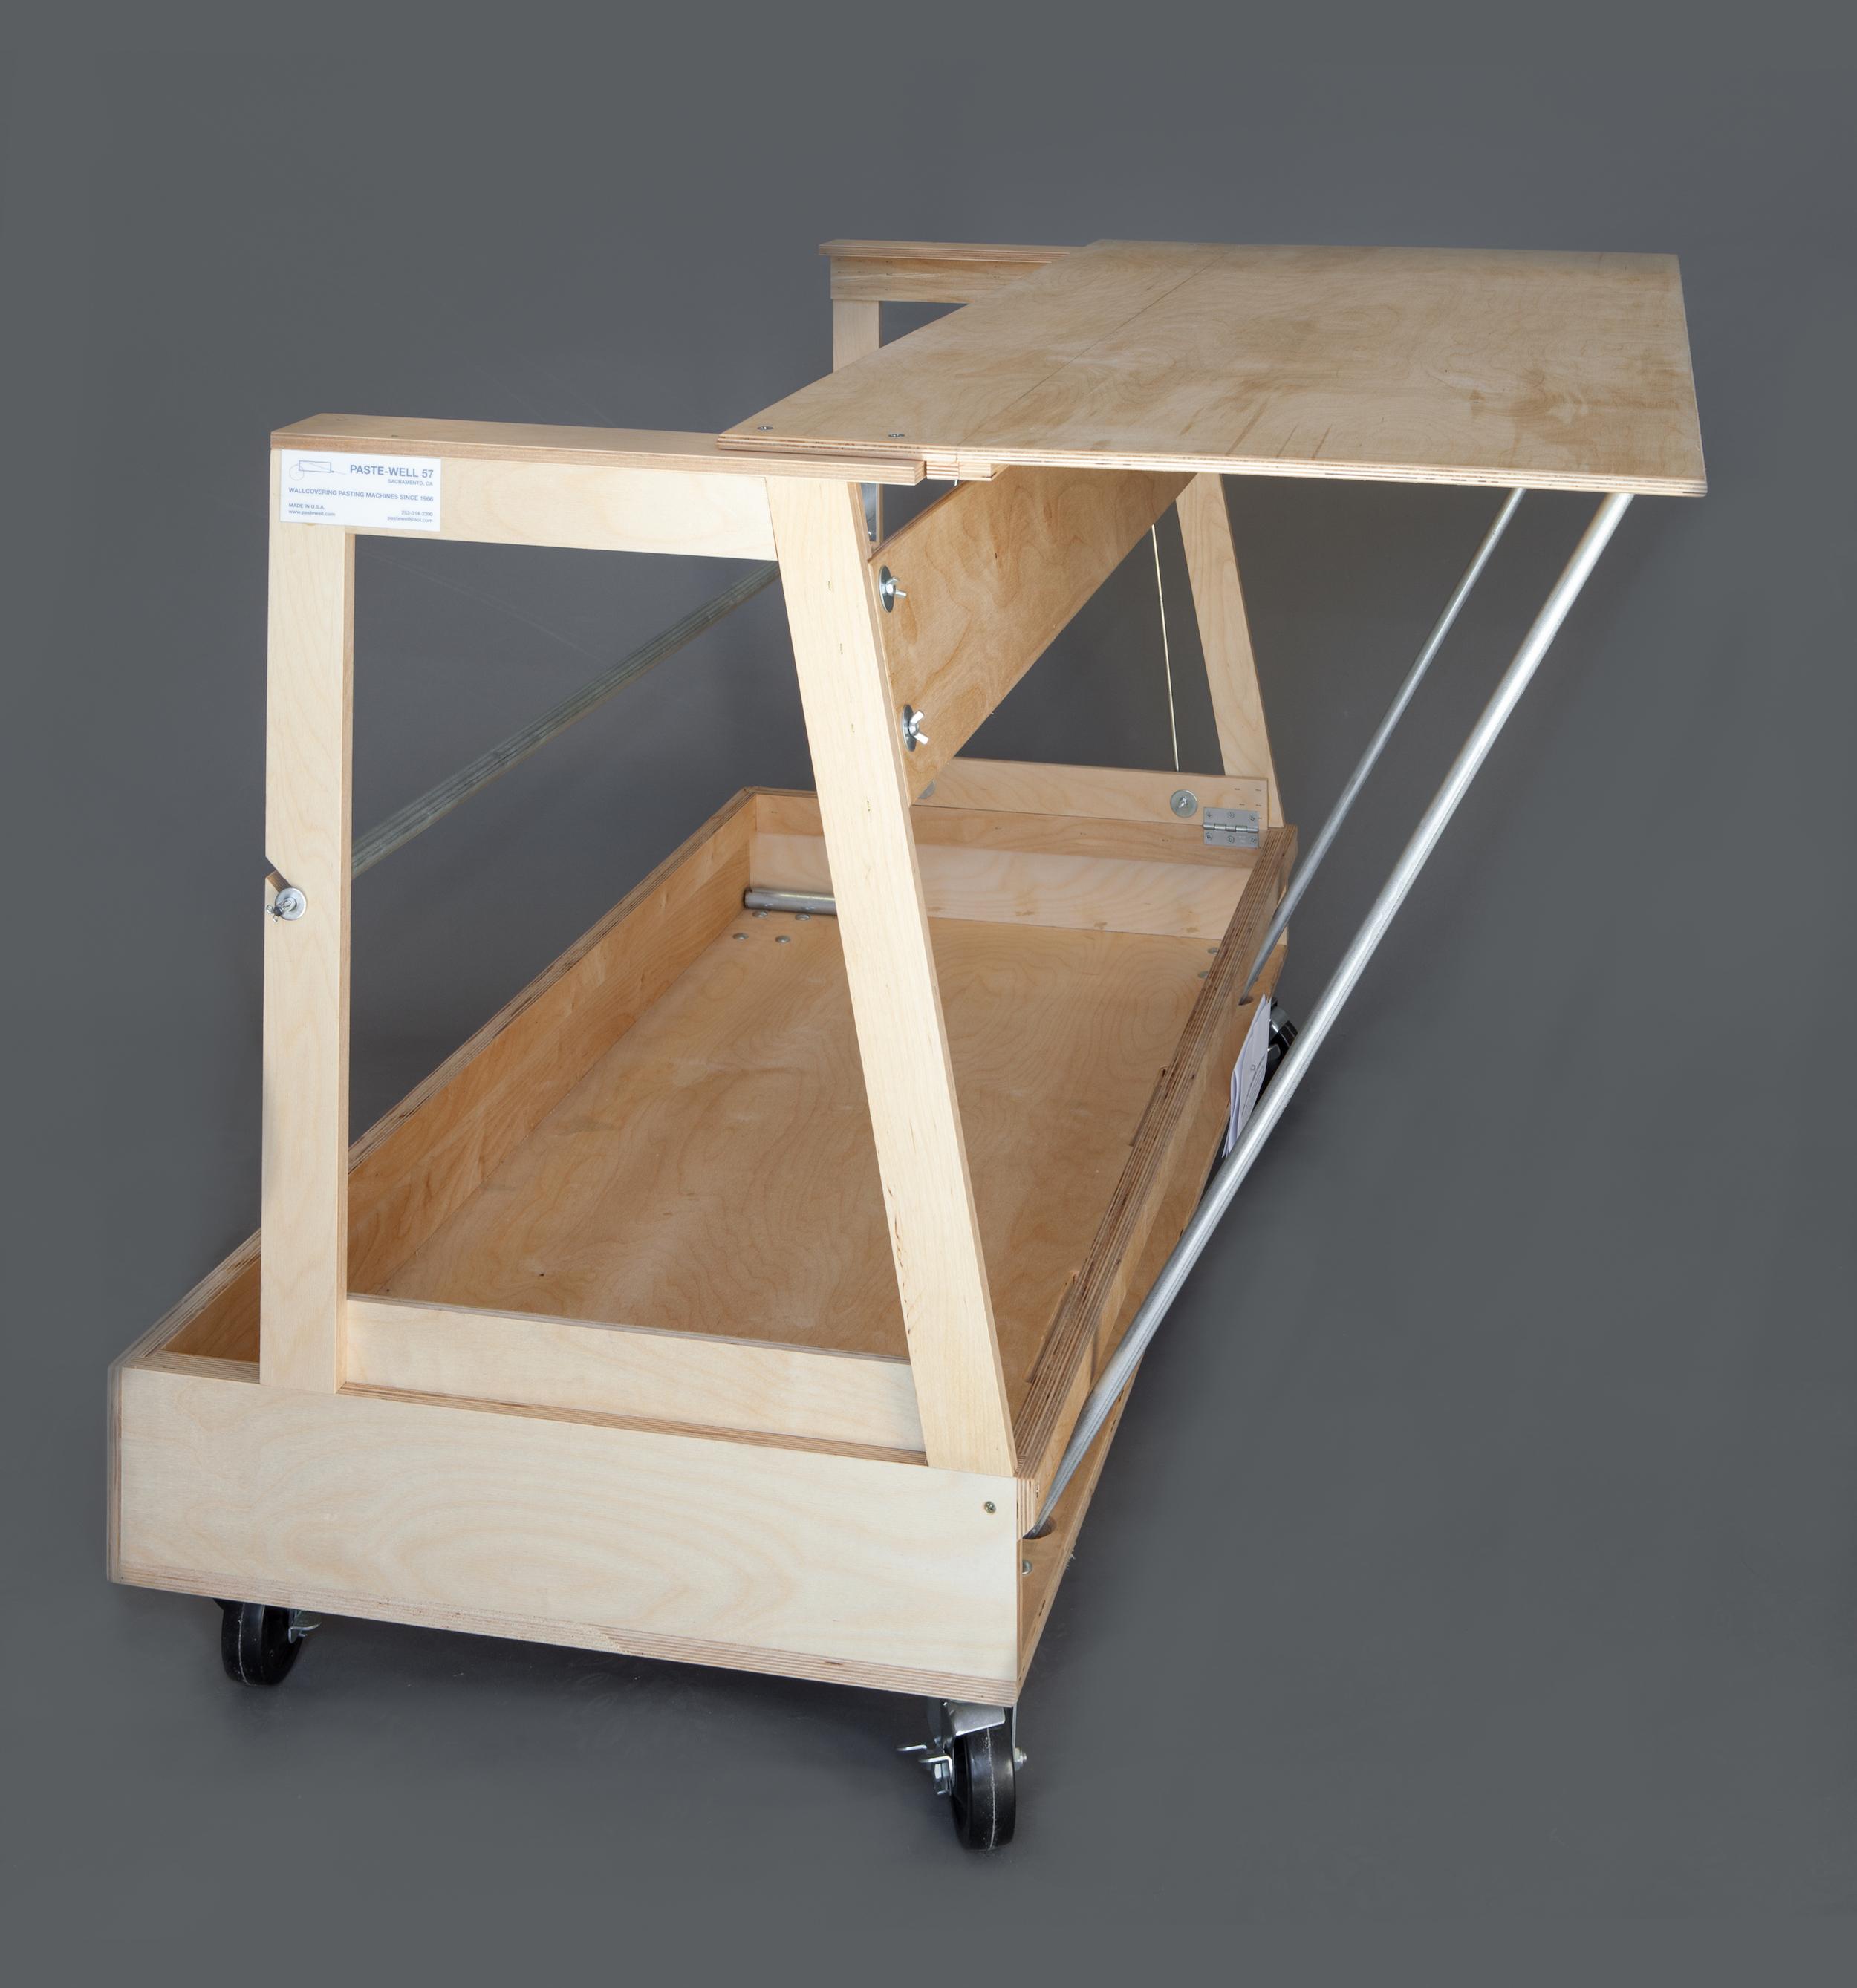 Work Bench - $675